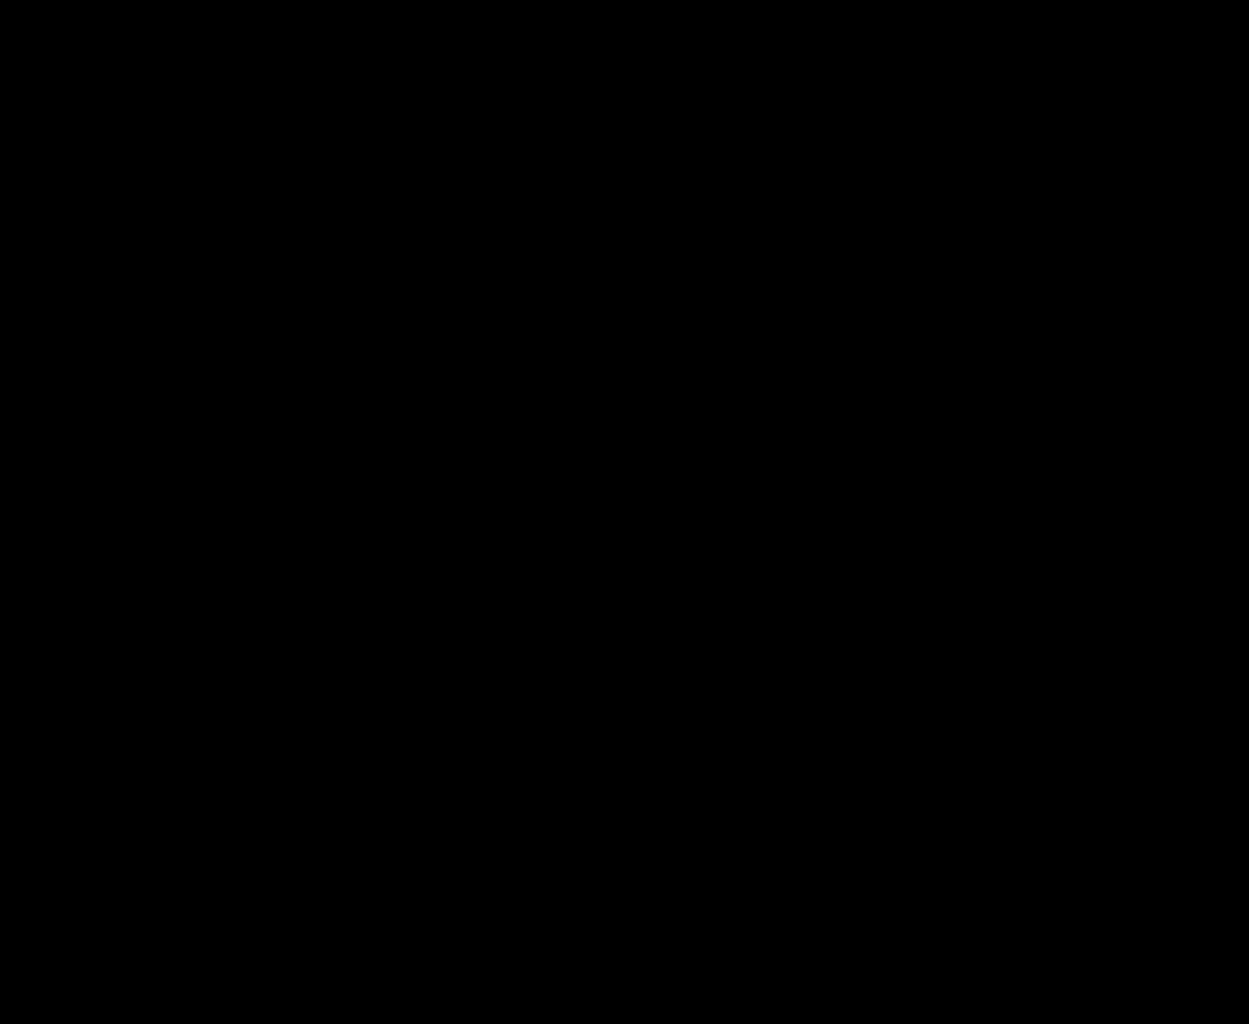 Gaming logo svg clipart png freeuse Gaming icon clipart - ClipartFest png freeuse